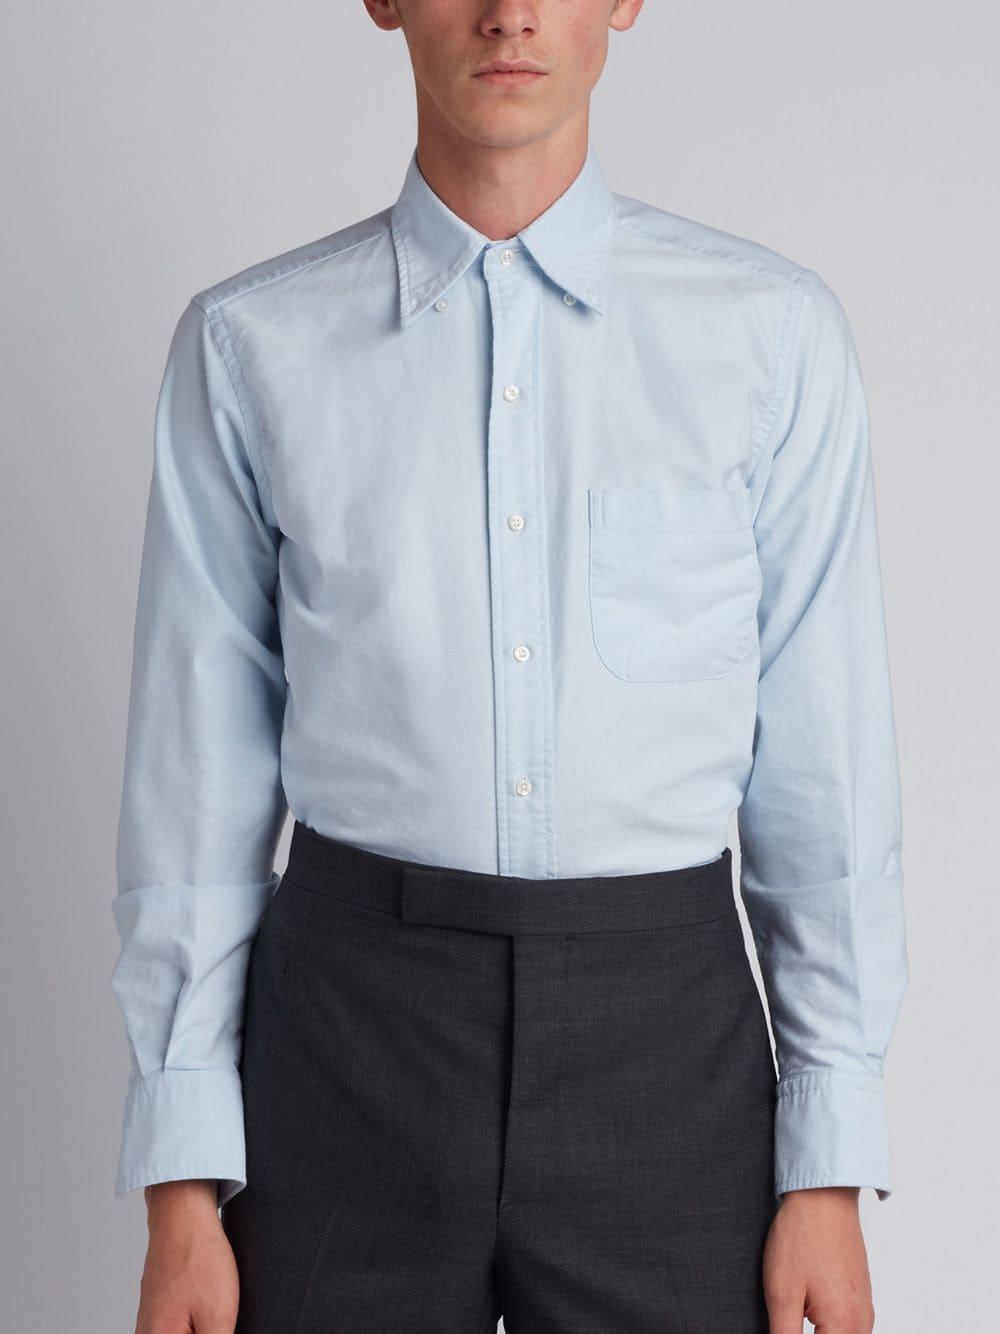 b56ec131b7f Thom Browne Classic Oxford Shirt in Blue for Men - Lyst